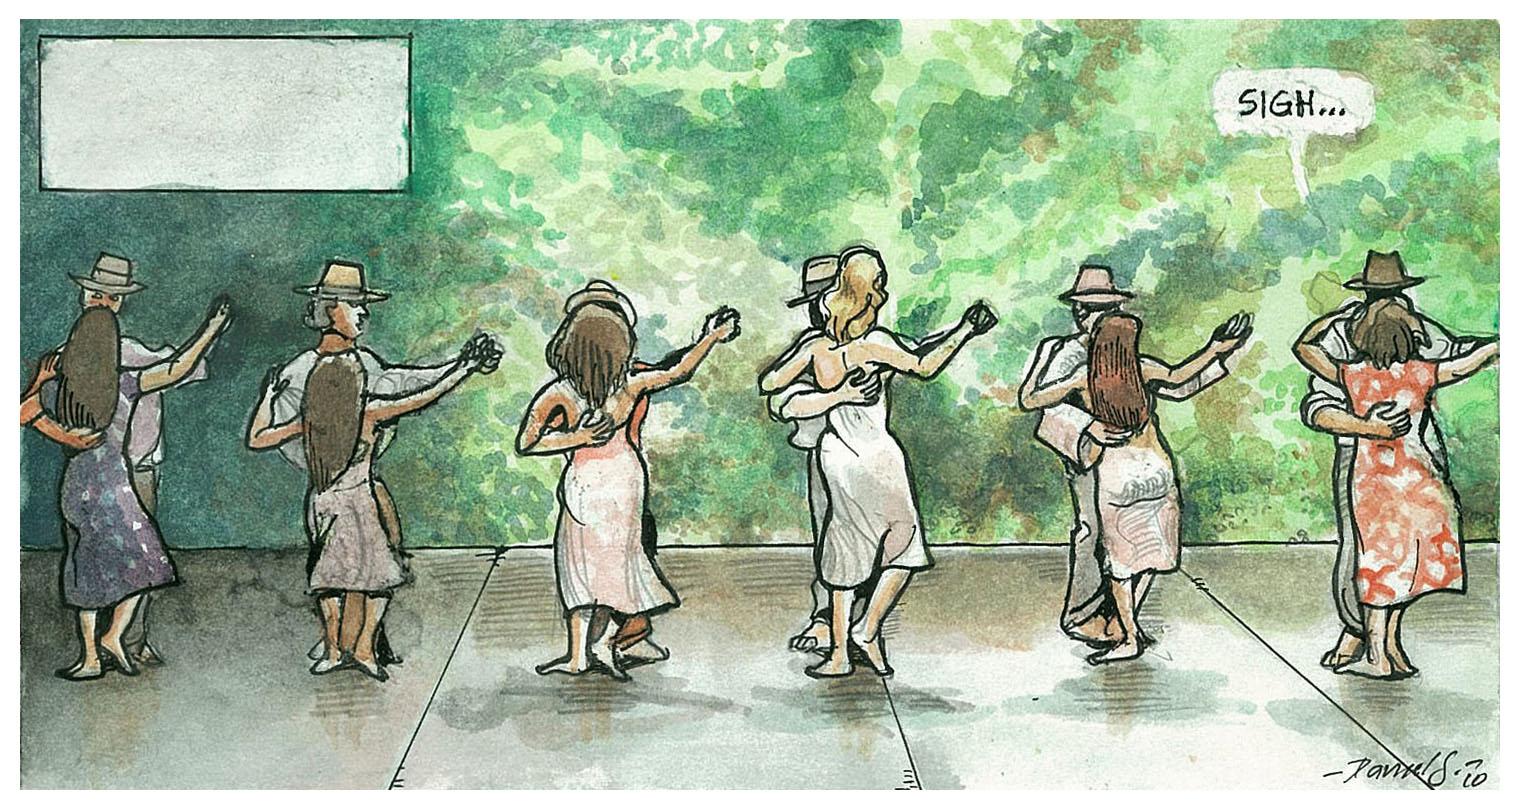 Daniel Garcia Art Illustration Almodovar Hable con Ella